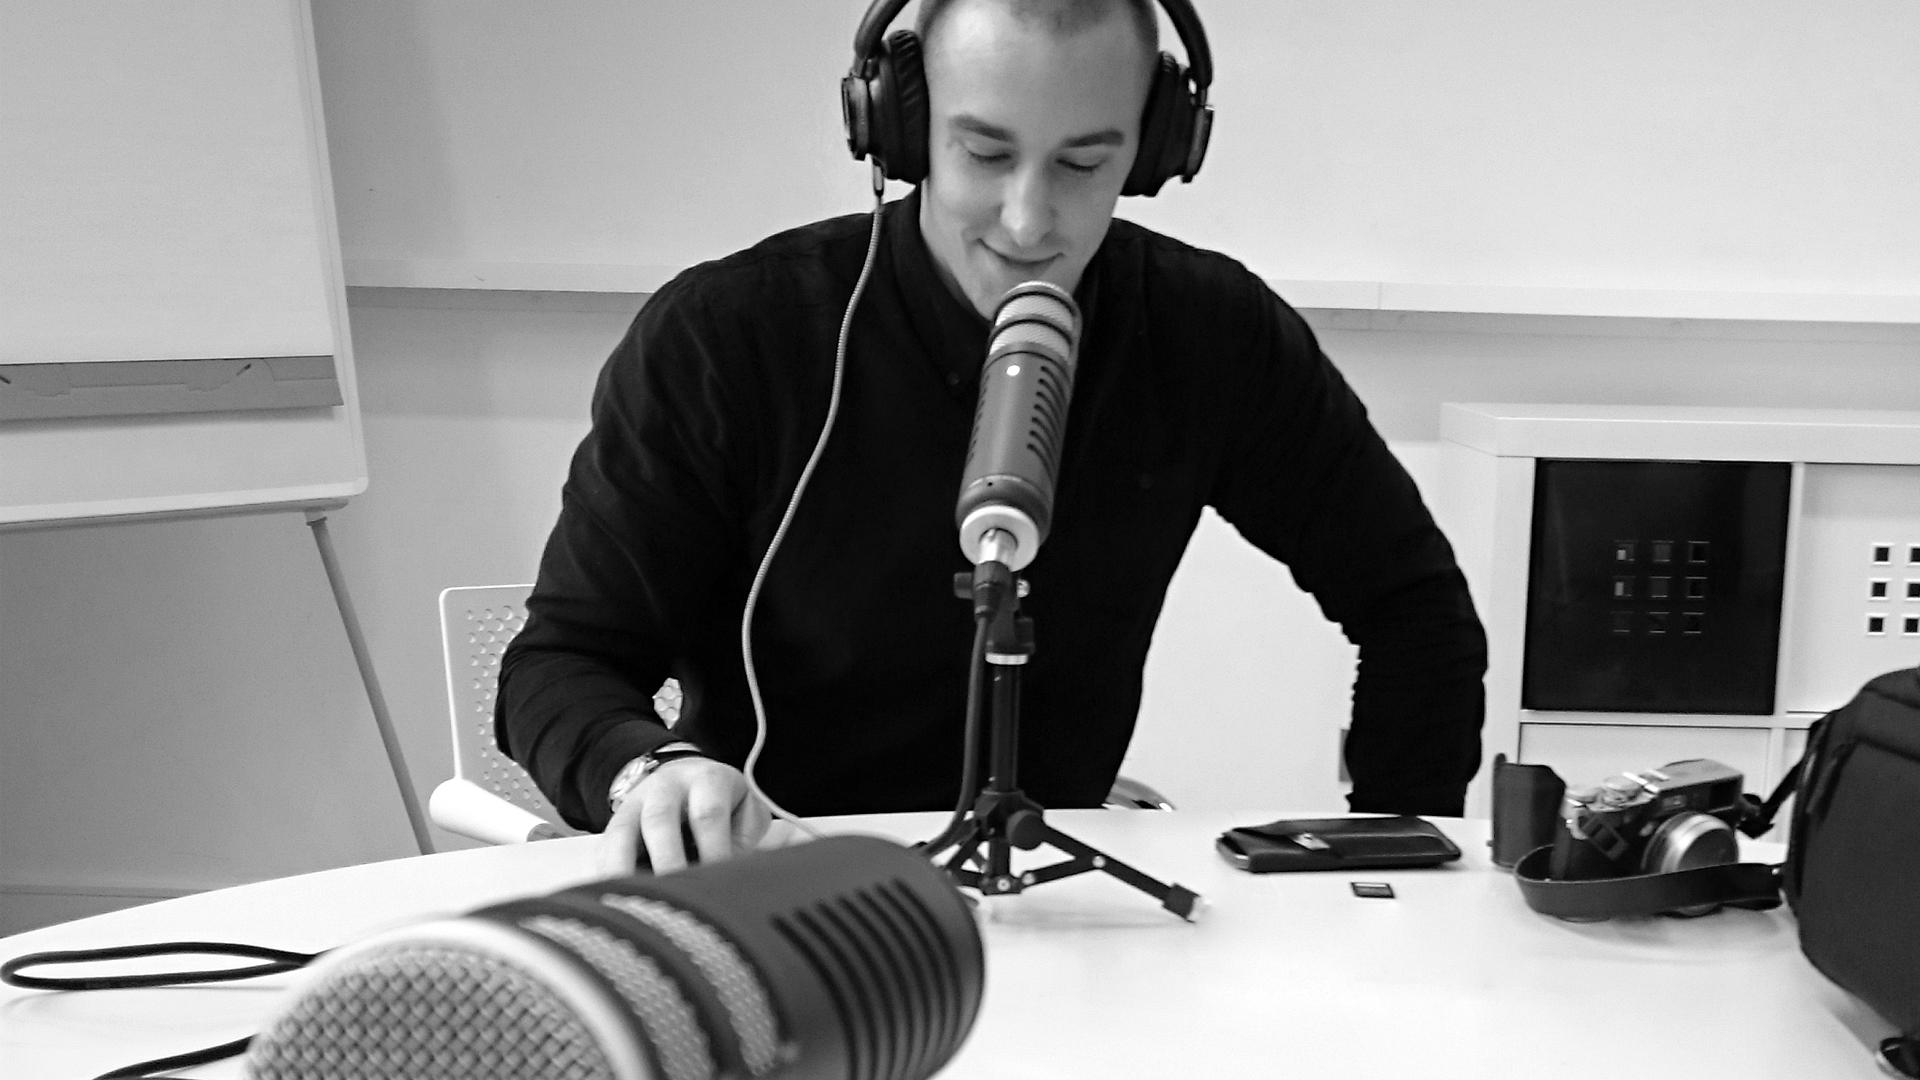 Ricky Richards Represents Podcast